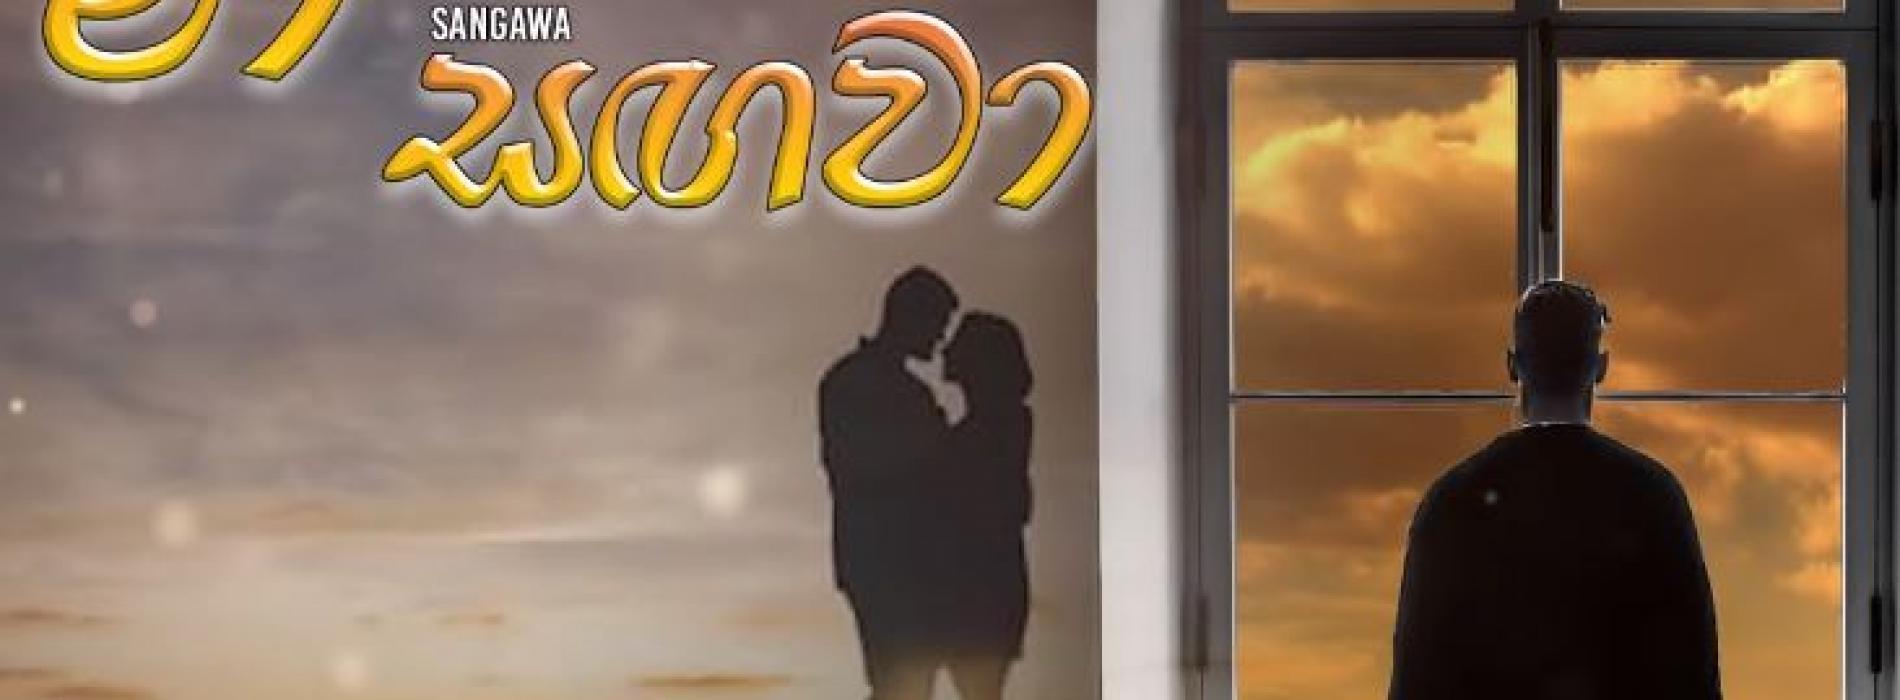 New Music : මා සඟවා | Ma Sangawa – Mihindu Ariyaratne (Official Lyric Video)